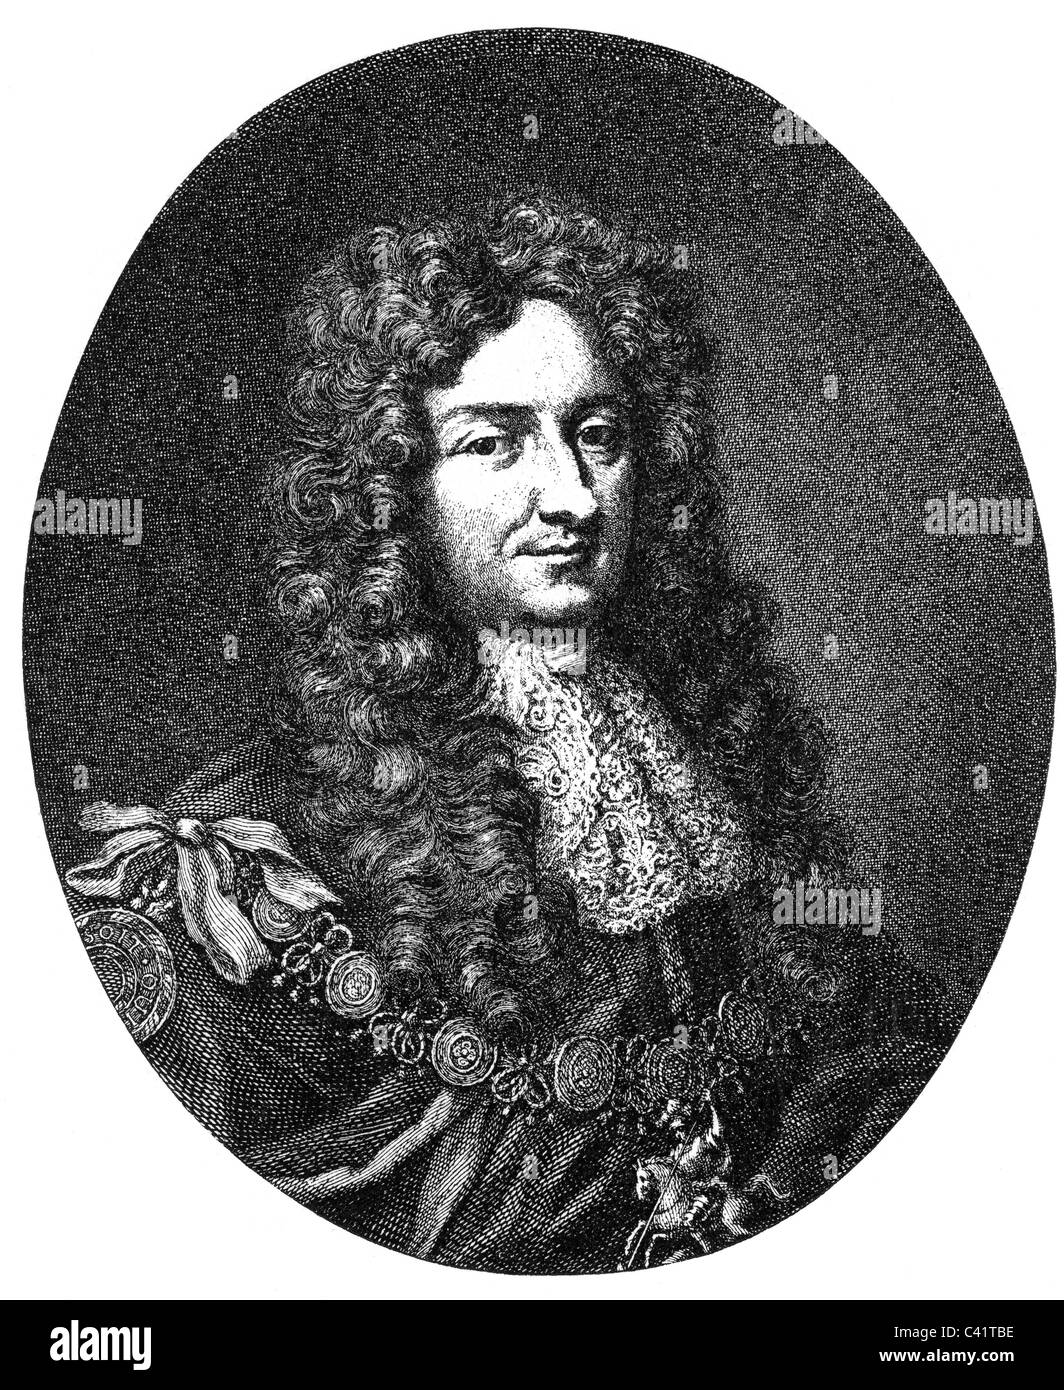 Hyde, Laurence, 1r Earl de Rochester, Marzo 1641 - 2.5.1711, políticos ingleses, retrato, grabado en cobre por Jacobus Houbraken, siglo XVIII, , Copyright del artista no ha de ser borrado Foto de stock